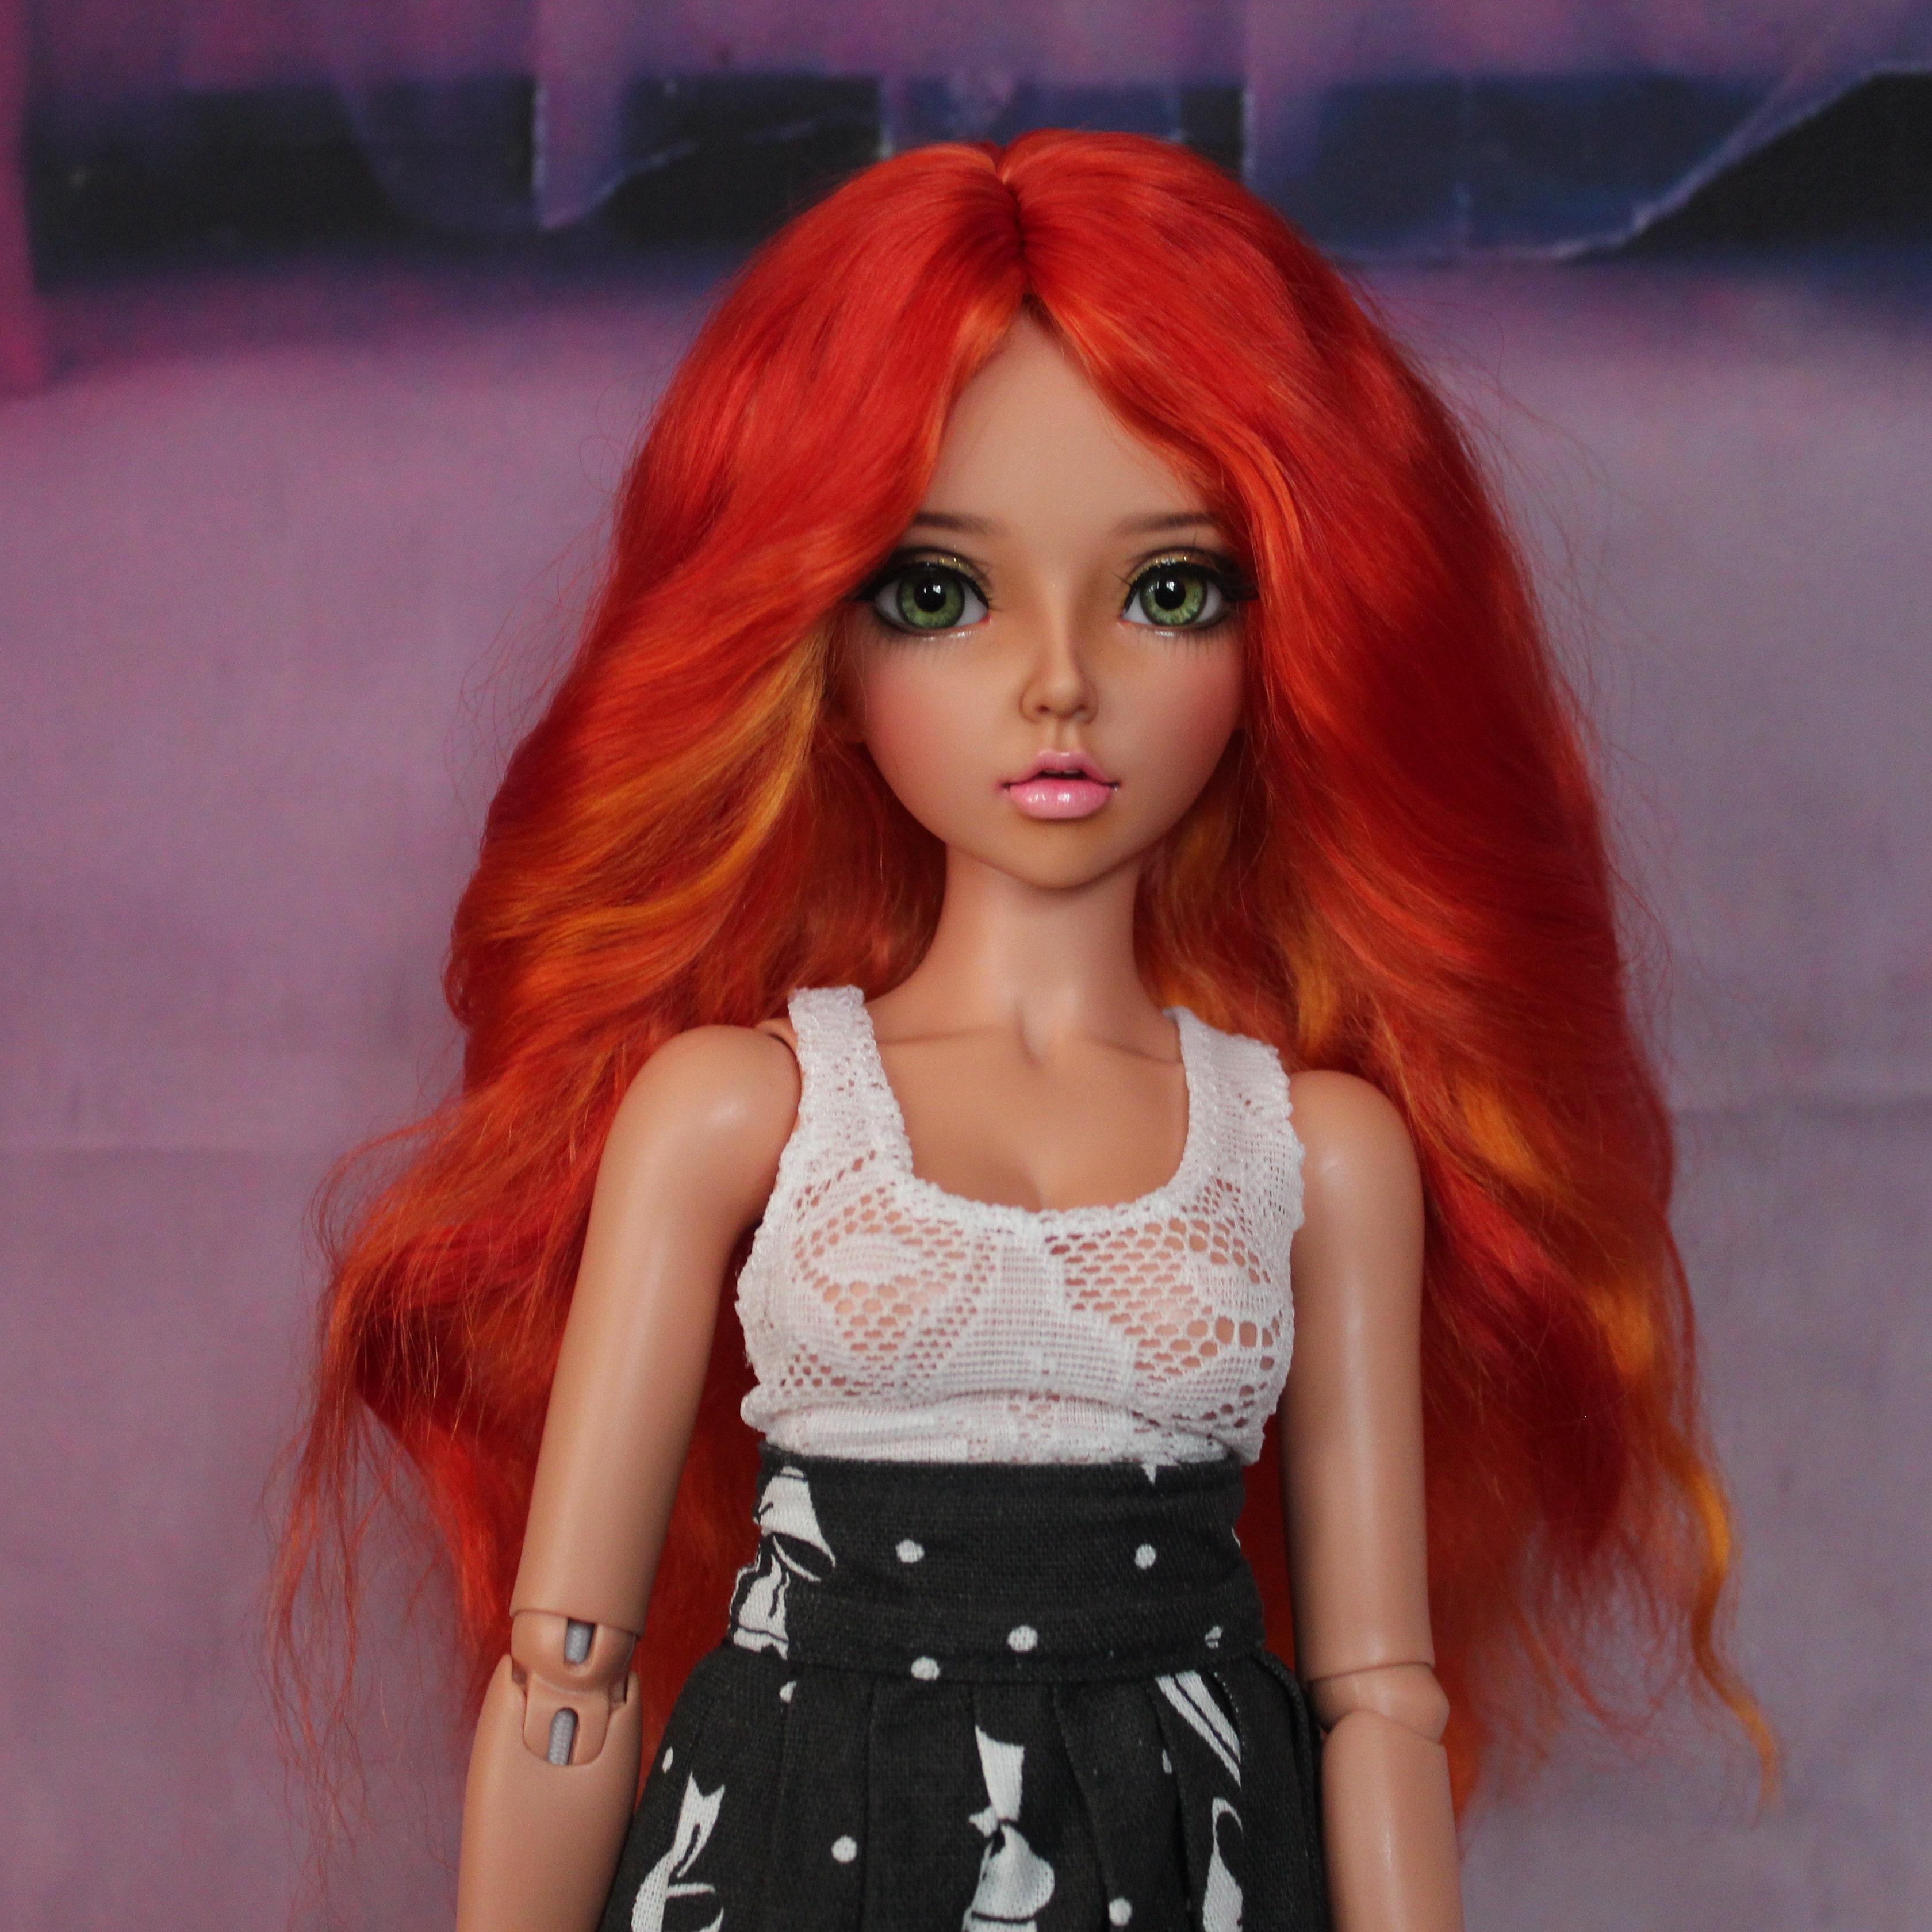 KateDollAtelier - BJD wigs from angora mohair